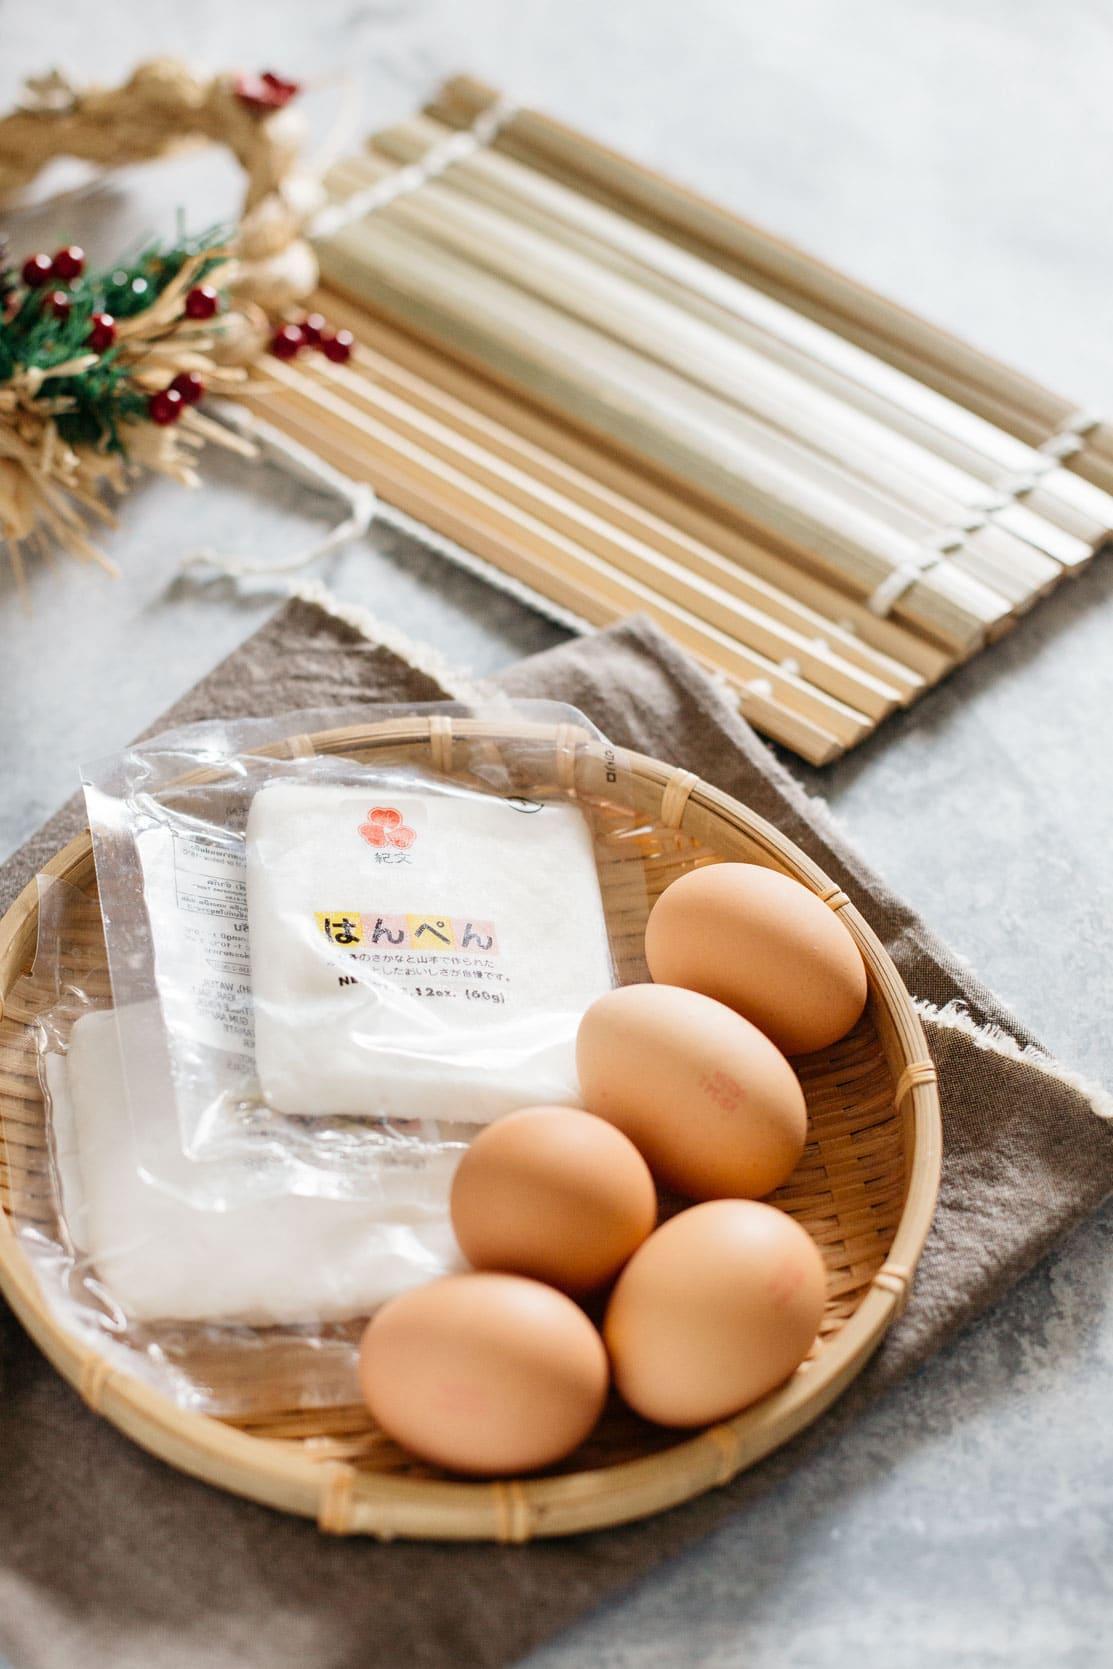 Kibun brand hanpen, 5 eggs, a special bamboo mat to roll egg omelette